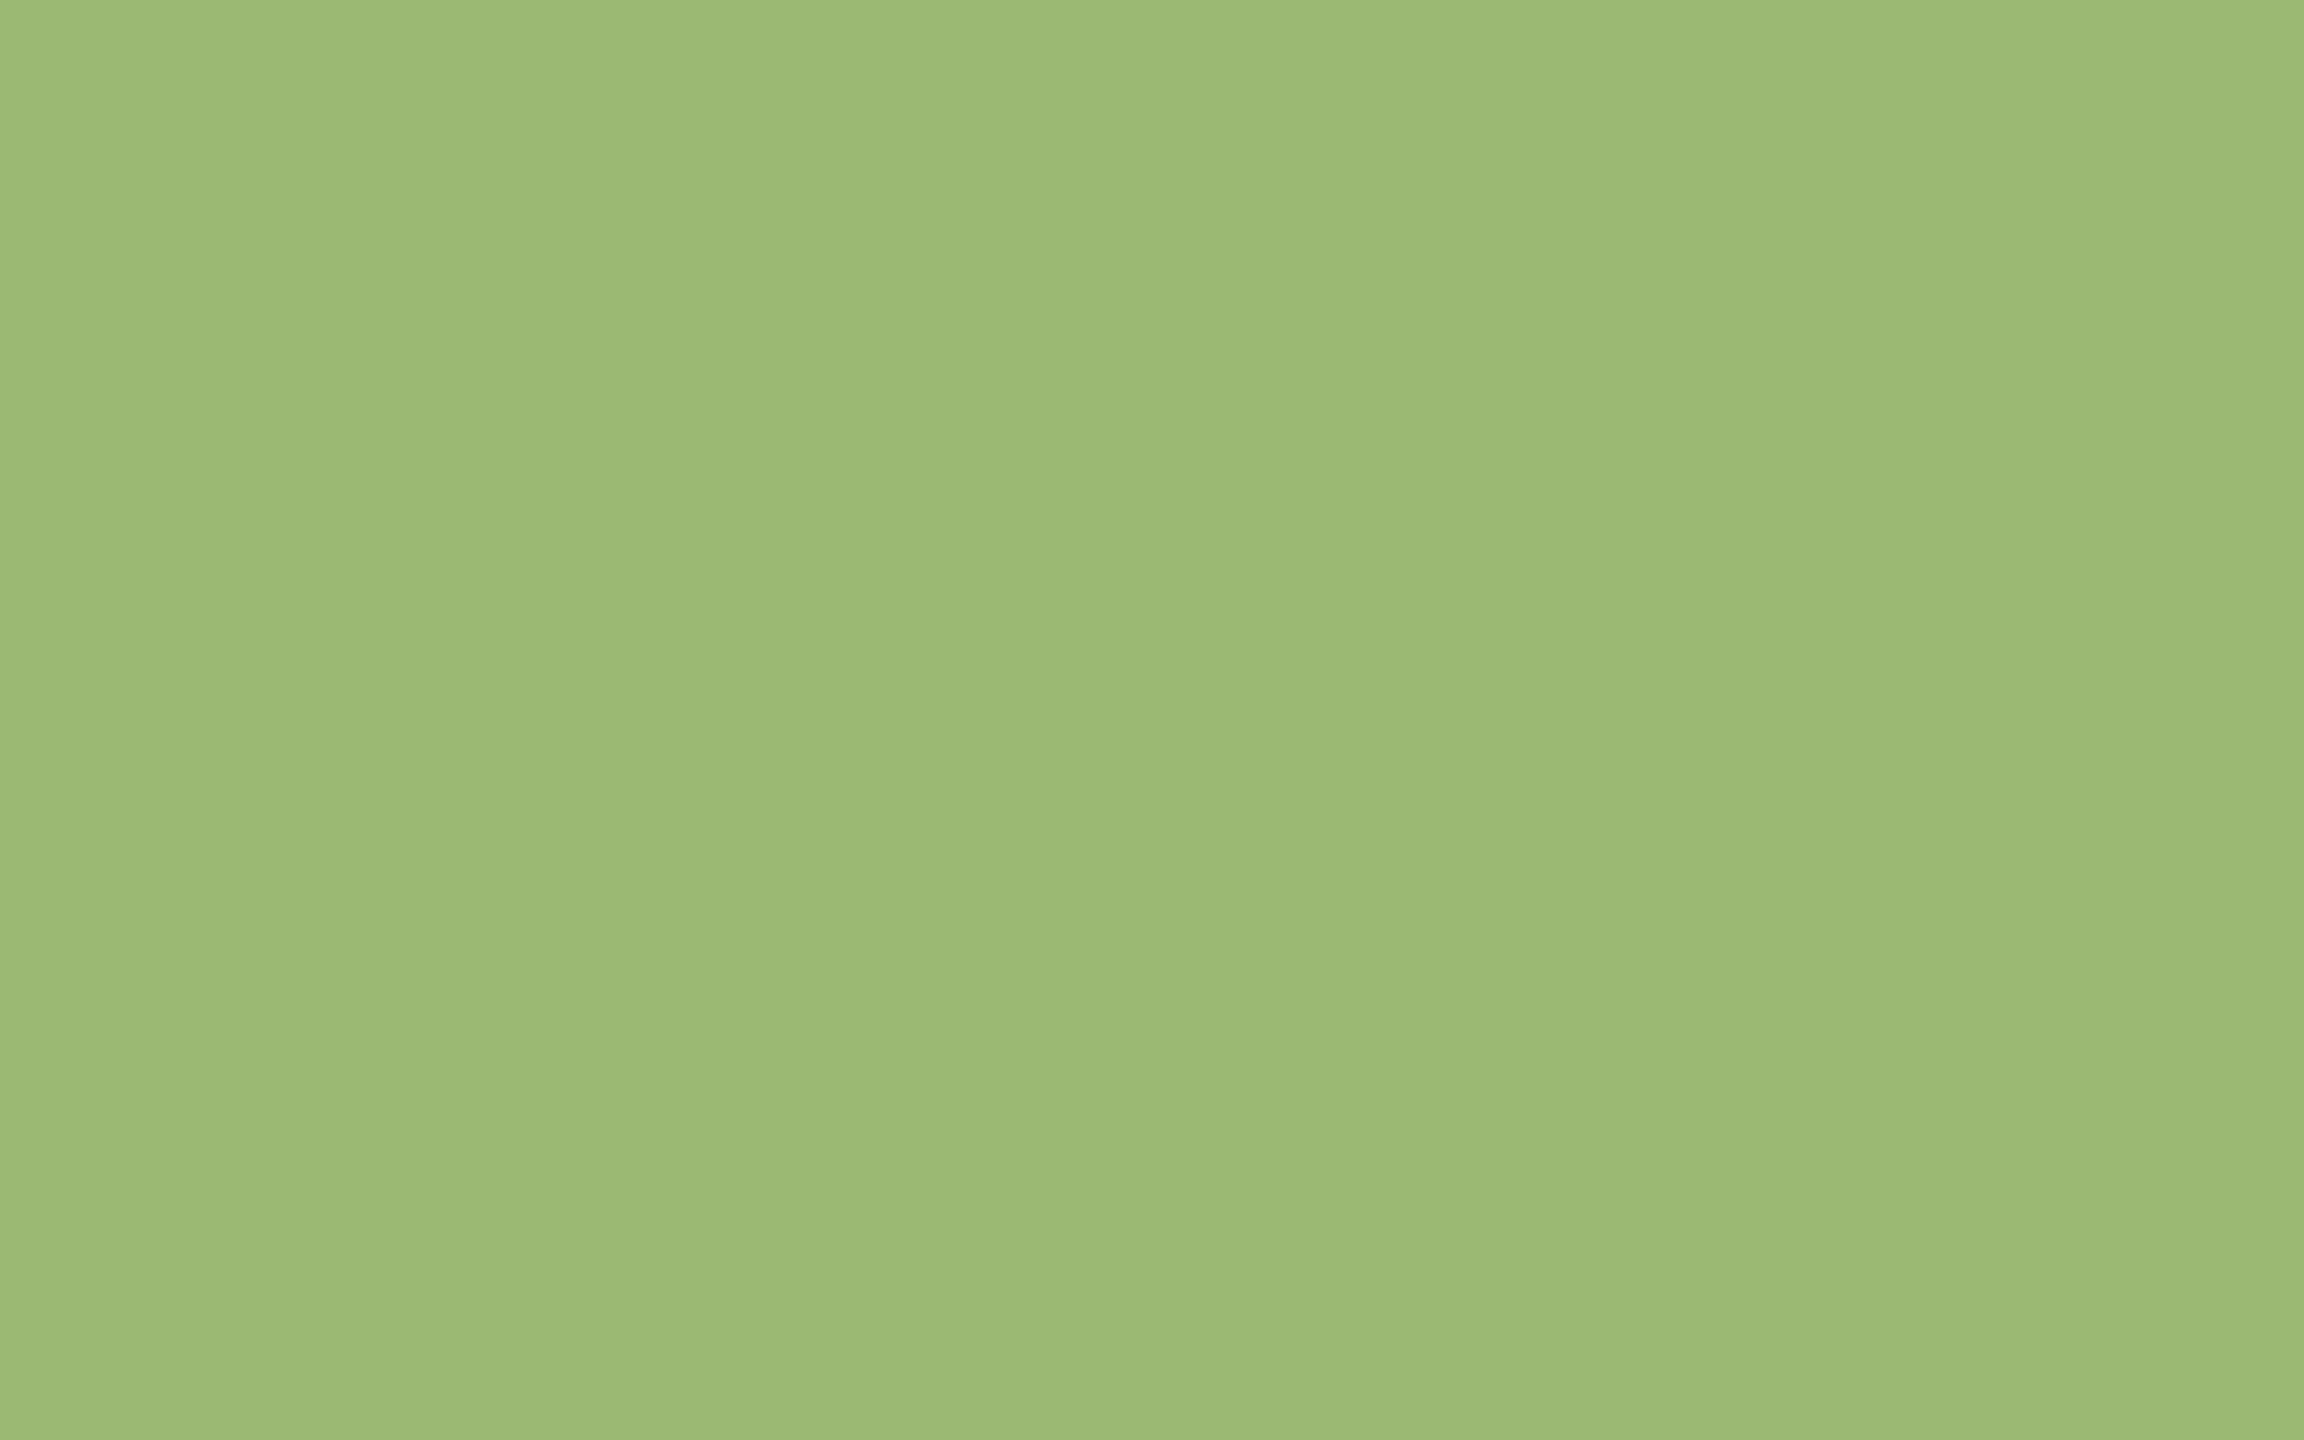 2304x1440 Olivine Solid Color Background